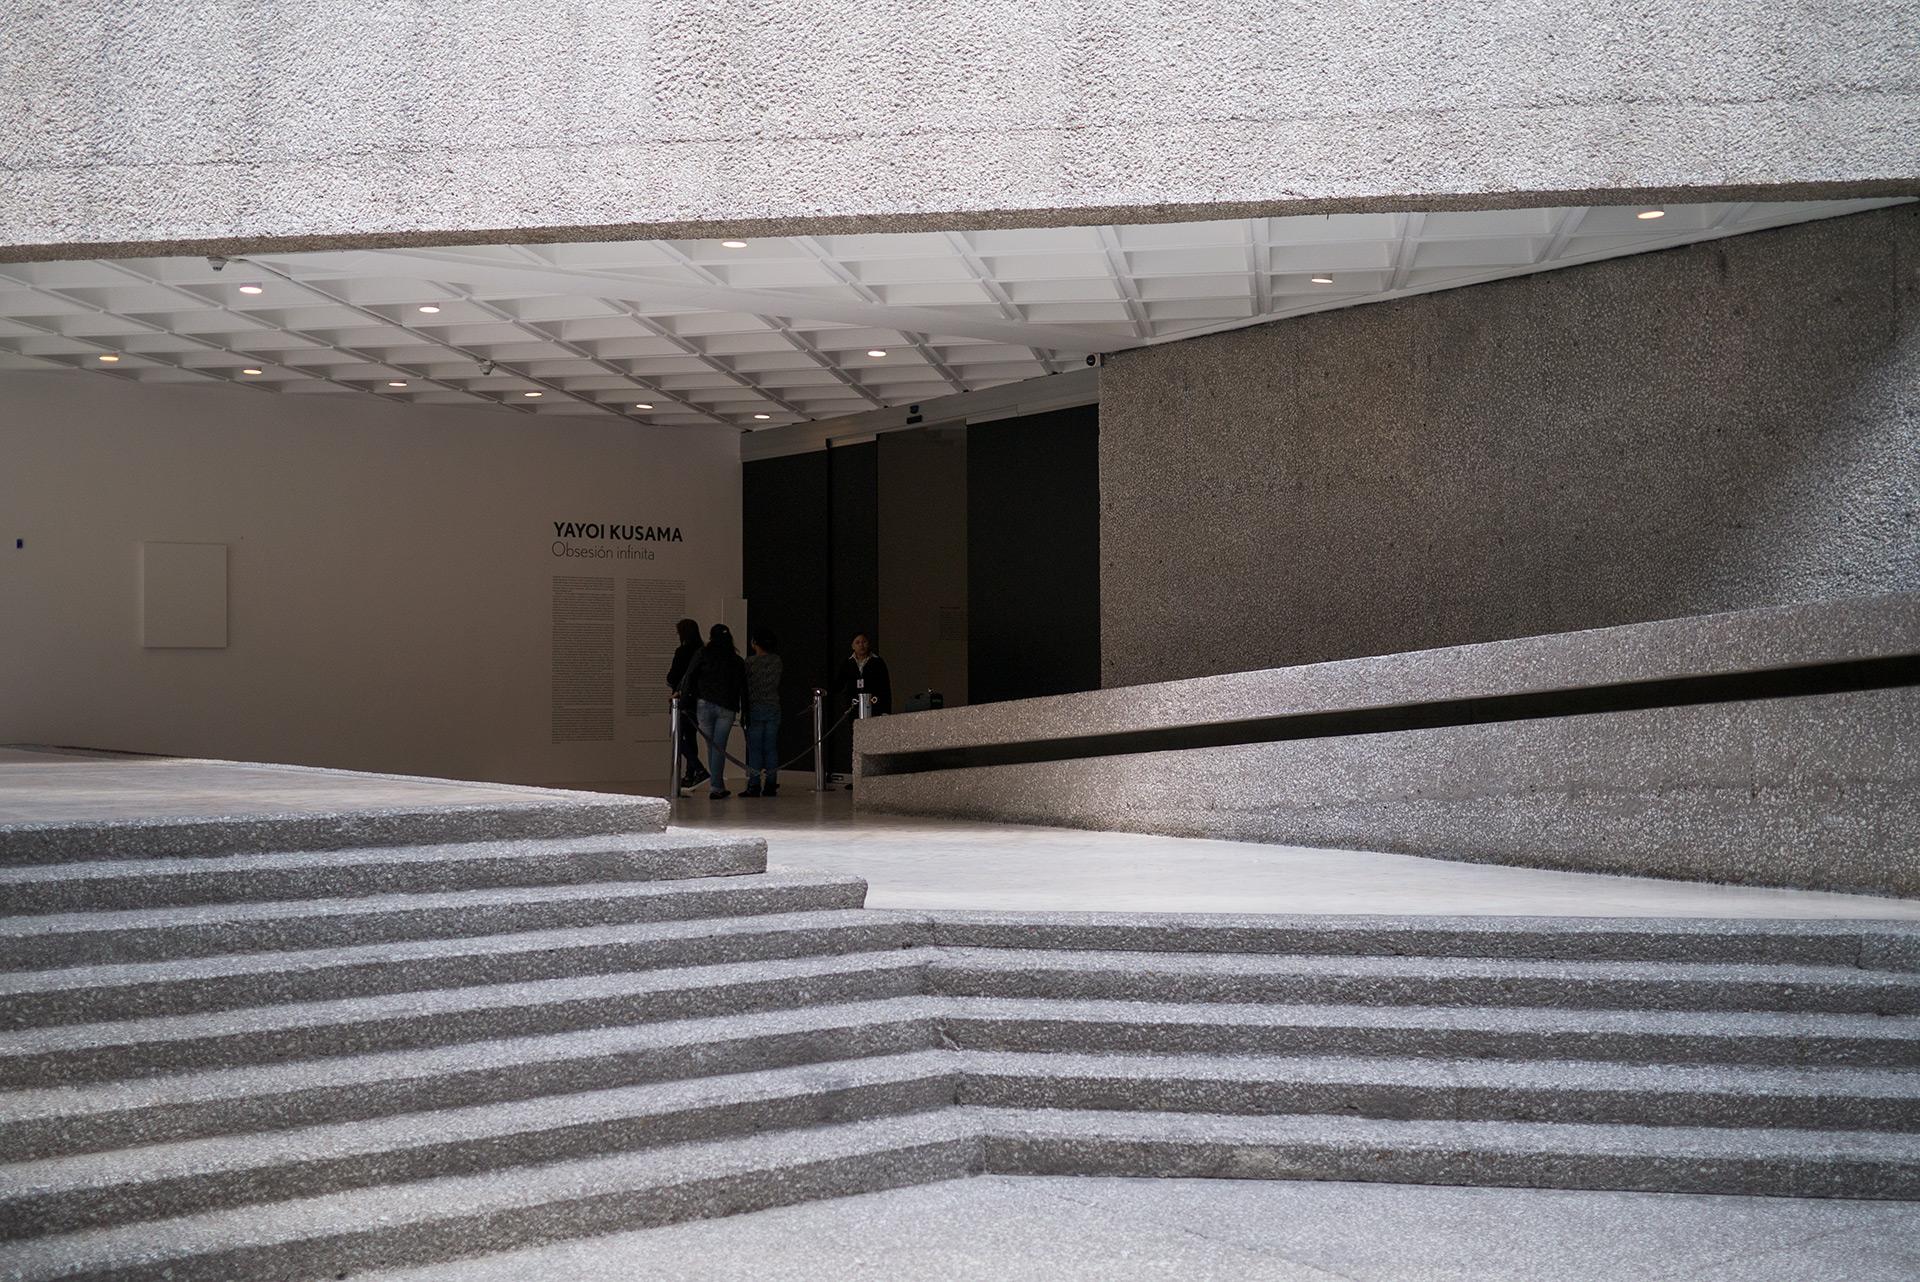 Museo Tamayo | © Christian Ramiro González Verón/Flickr